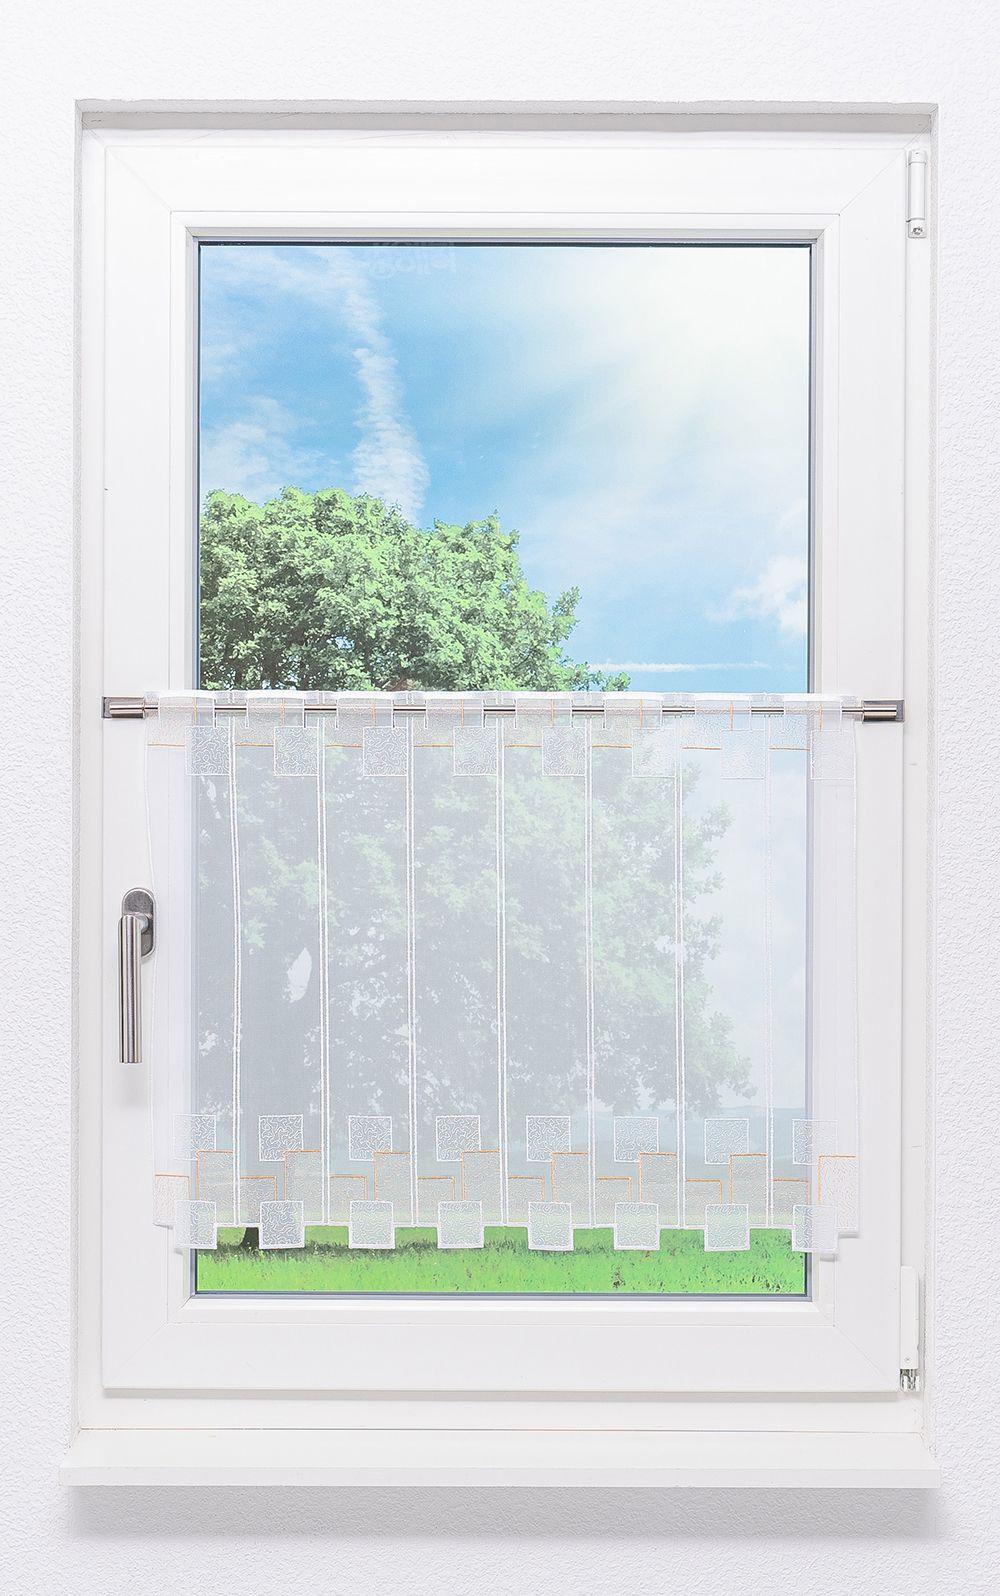 plauener spitze scheibengardinen blocks wei gold ebay. Black Bedroom Furniture Sets. Home Design Ideas